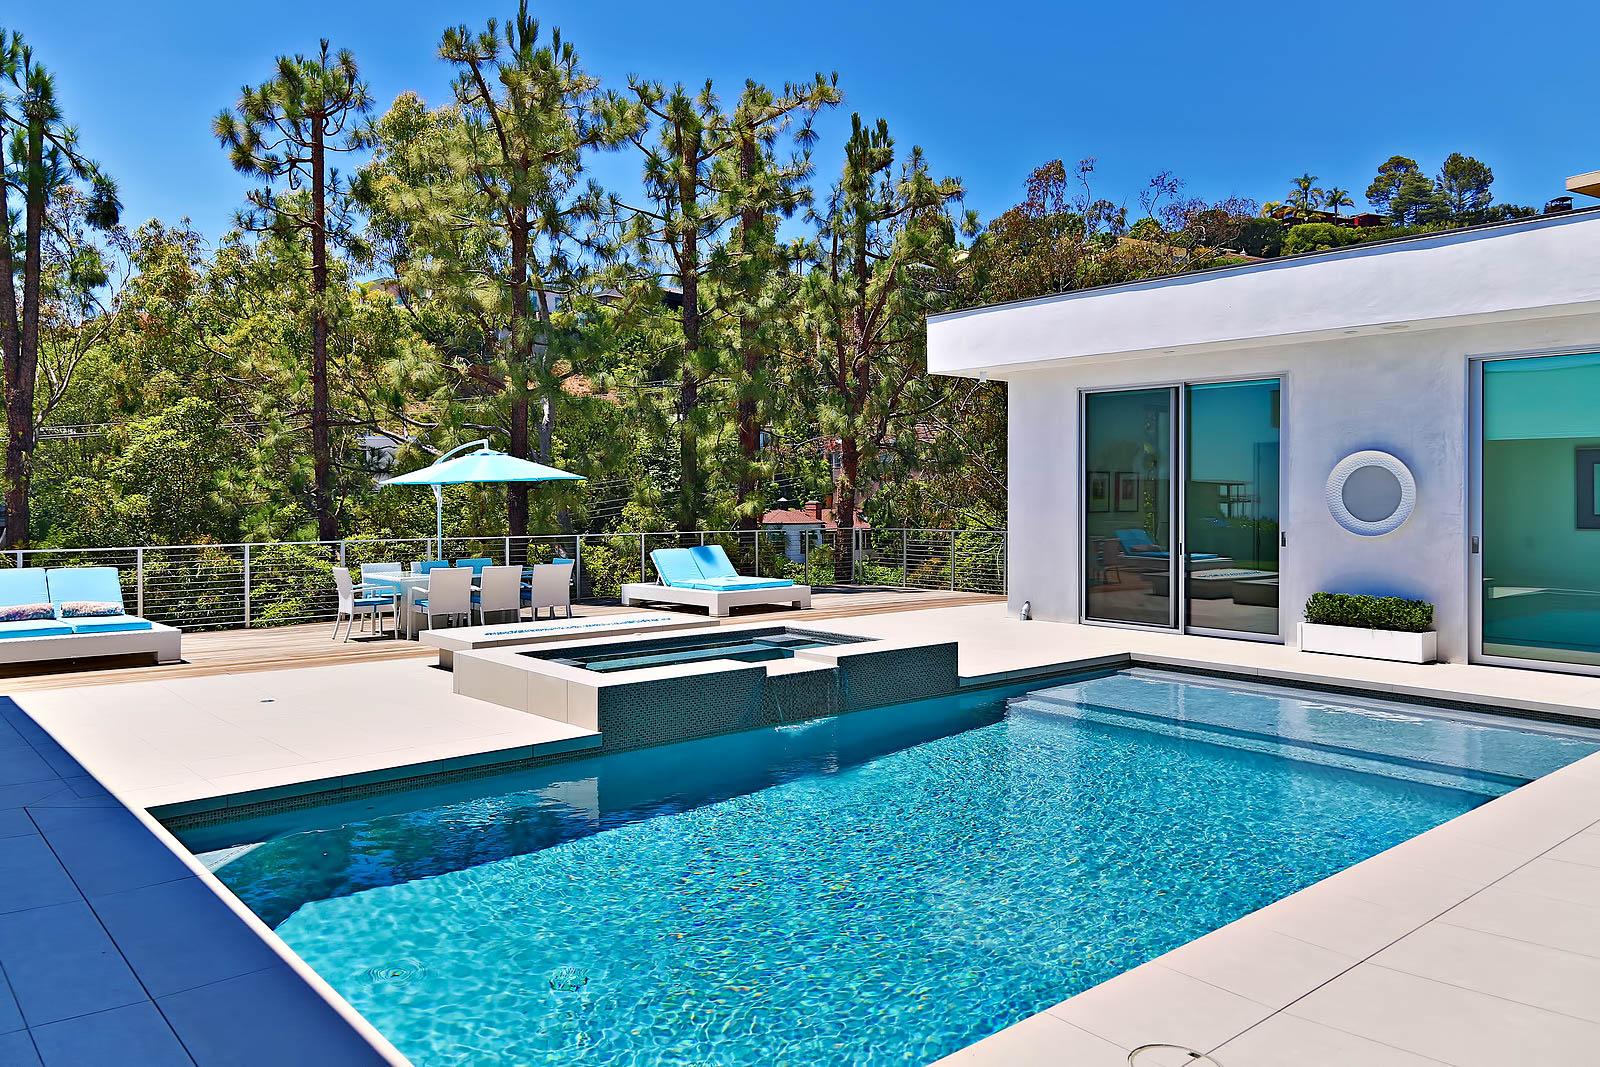 Trousdale Modern Contemporary – 1479 Carla Ridge, Beverly Hills, CA, USA